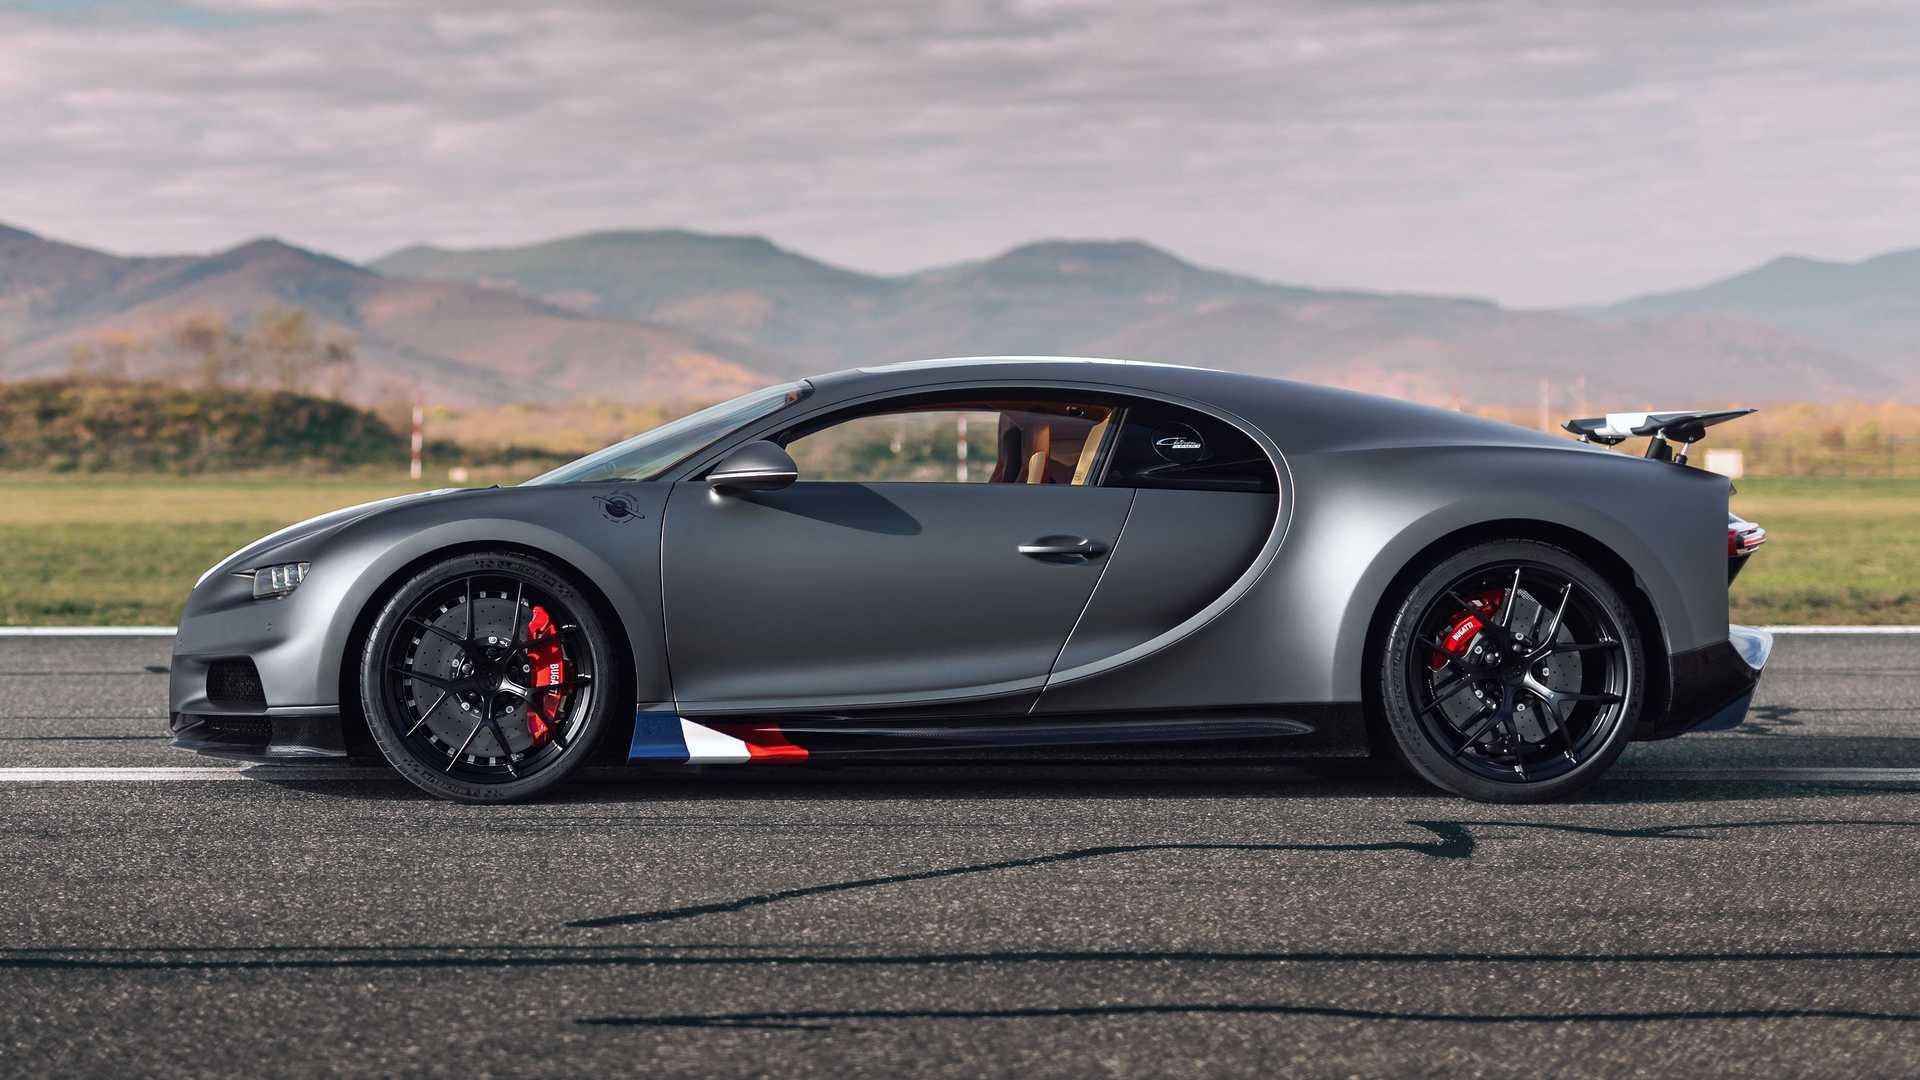 Bugatti Chiron Sport Les Légendes Du Ciel: 20 unidades en honor a la aviación   Lista de Carros